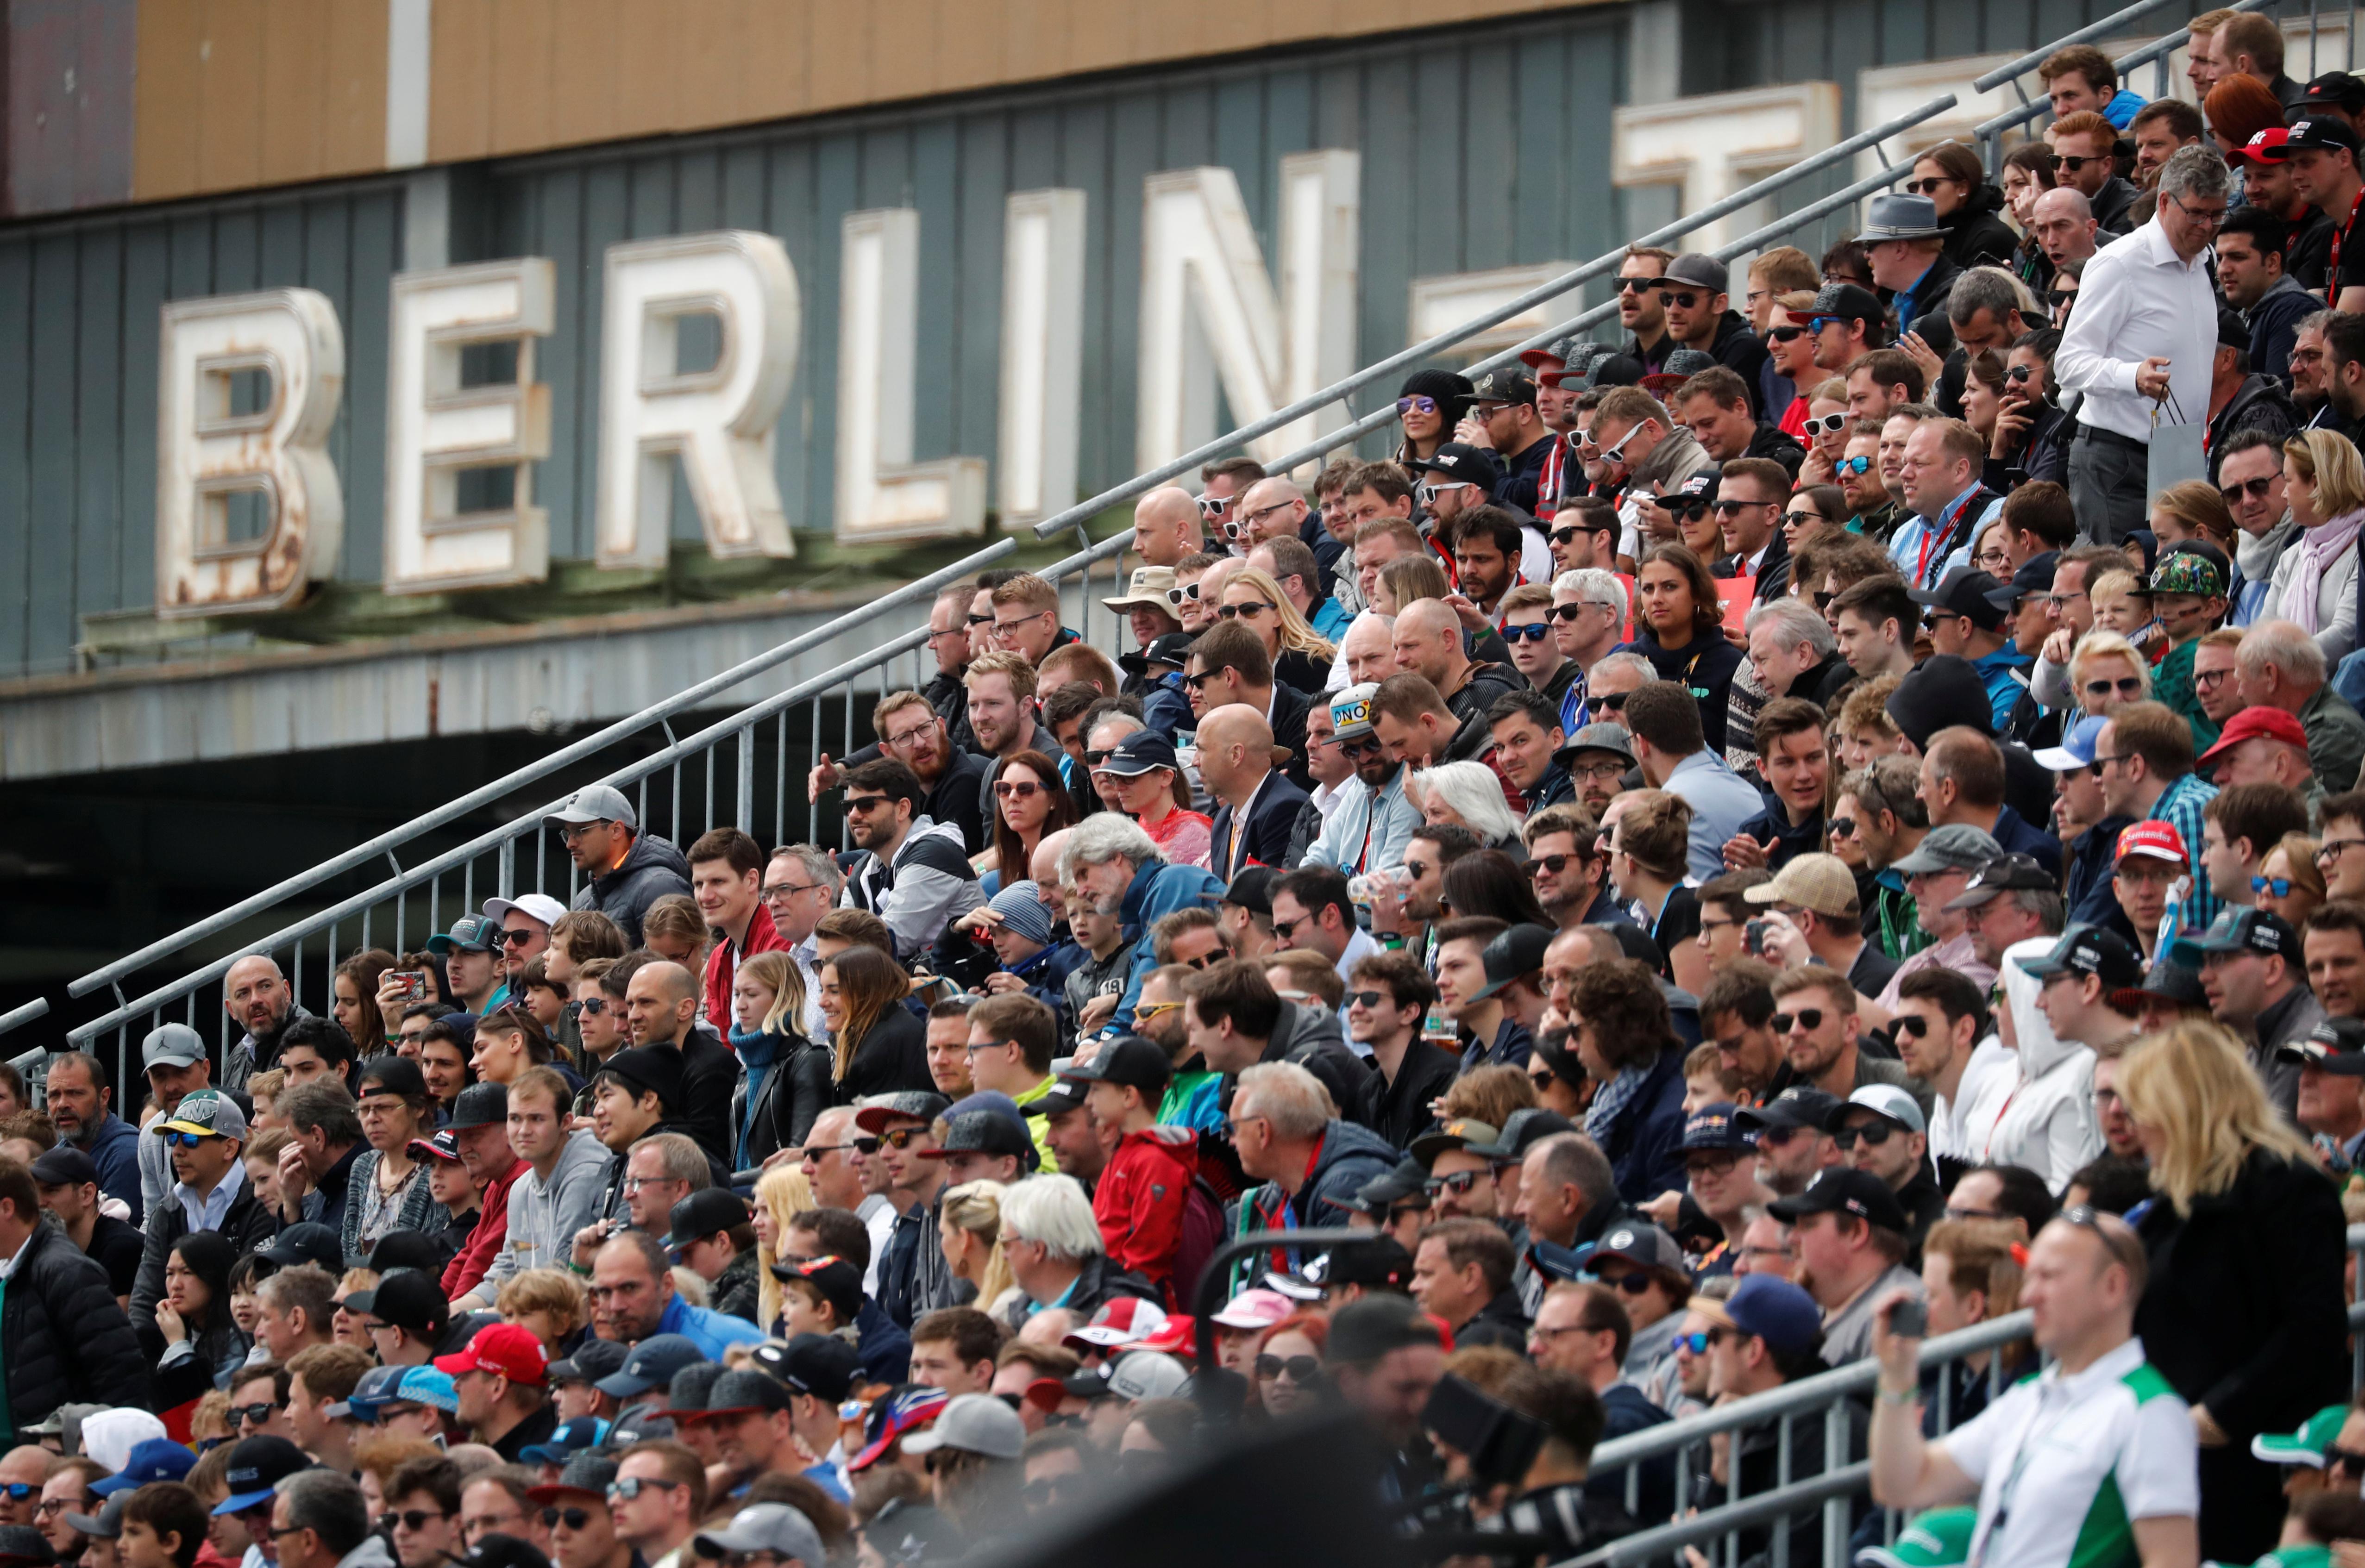 Motorsport - Formula E - Berlin ePrix - Berlin-Tempelhof, Berlin, Germany - May 25, 2019   General view of spectators in a stand   REUTERS/Hannibal Hanschke